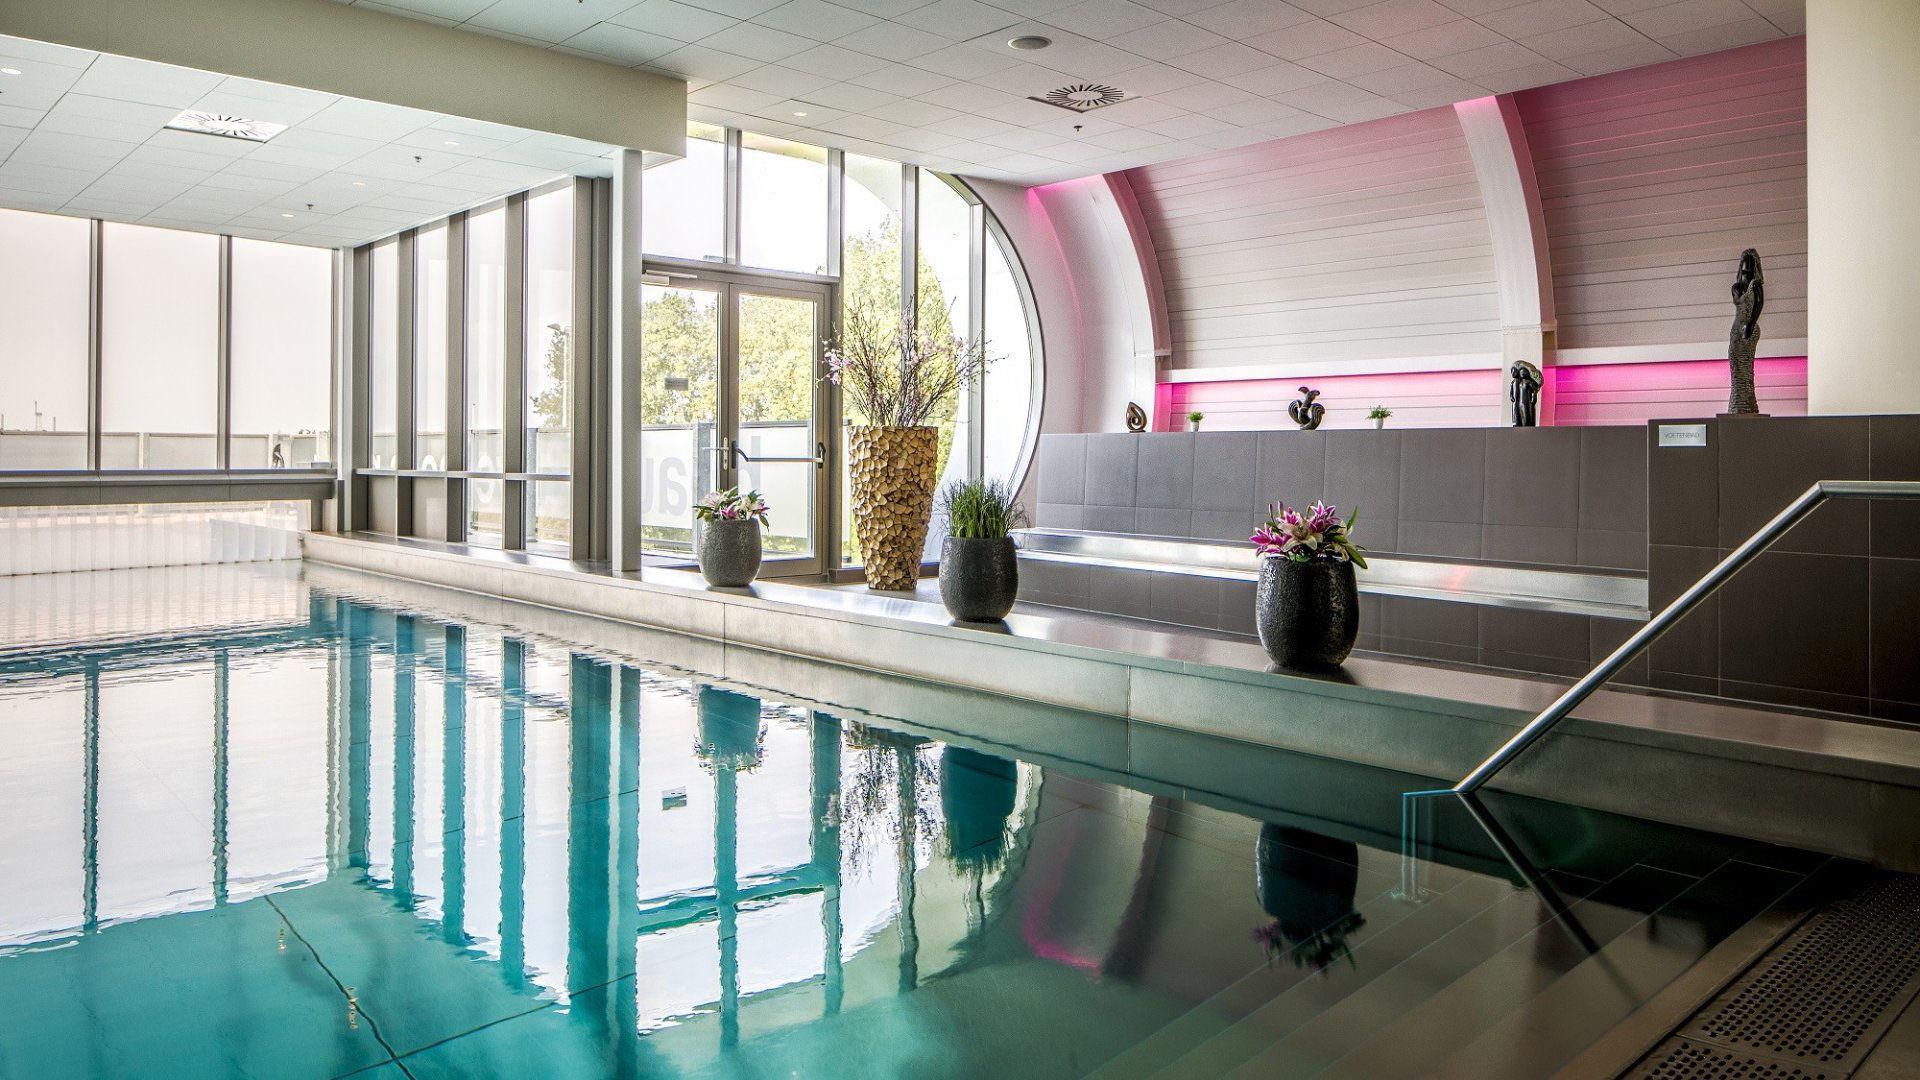 4*-hotel nabij Maastricht incl. entree Wellnessresort Sittard